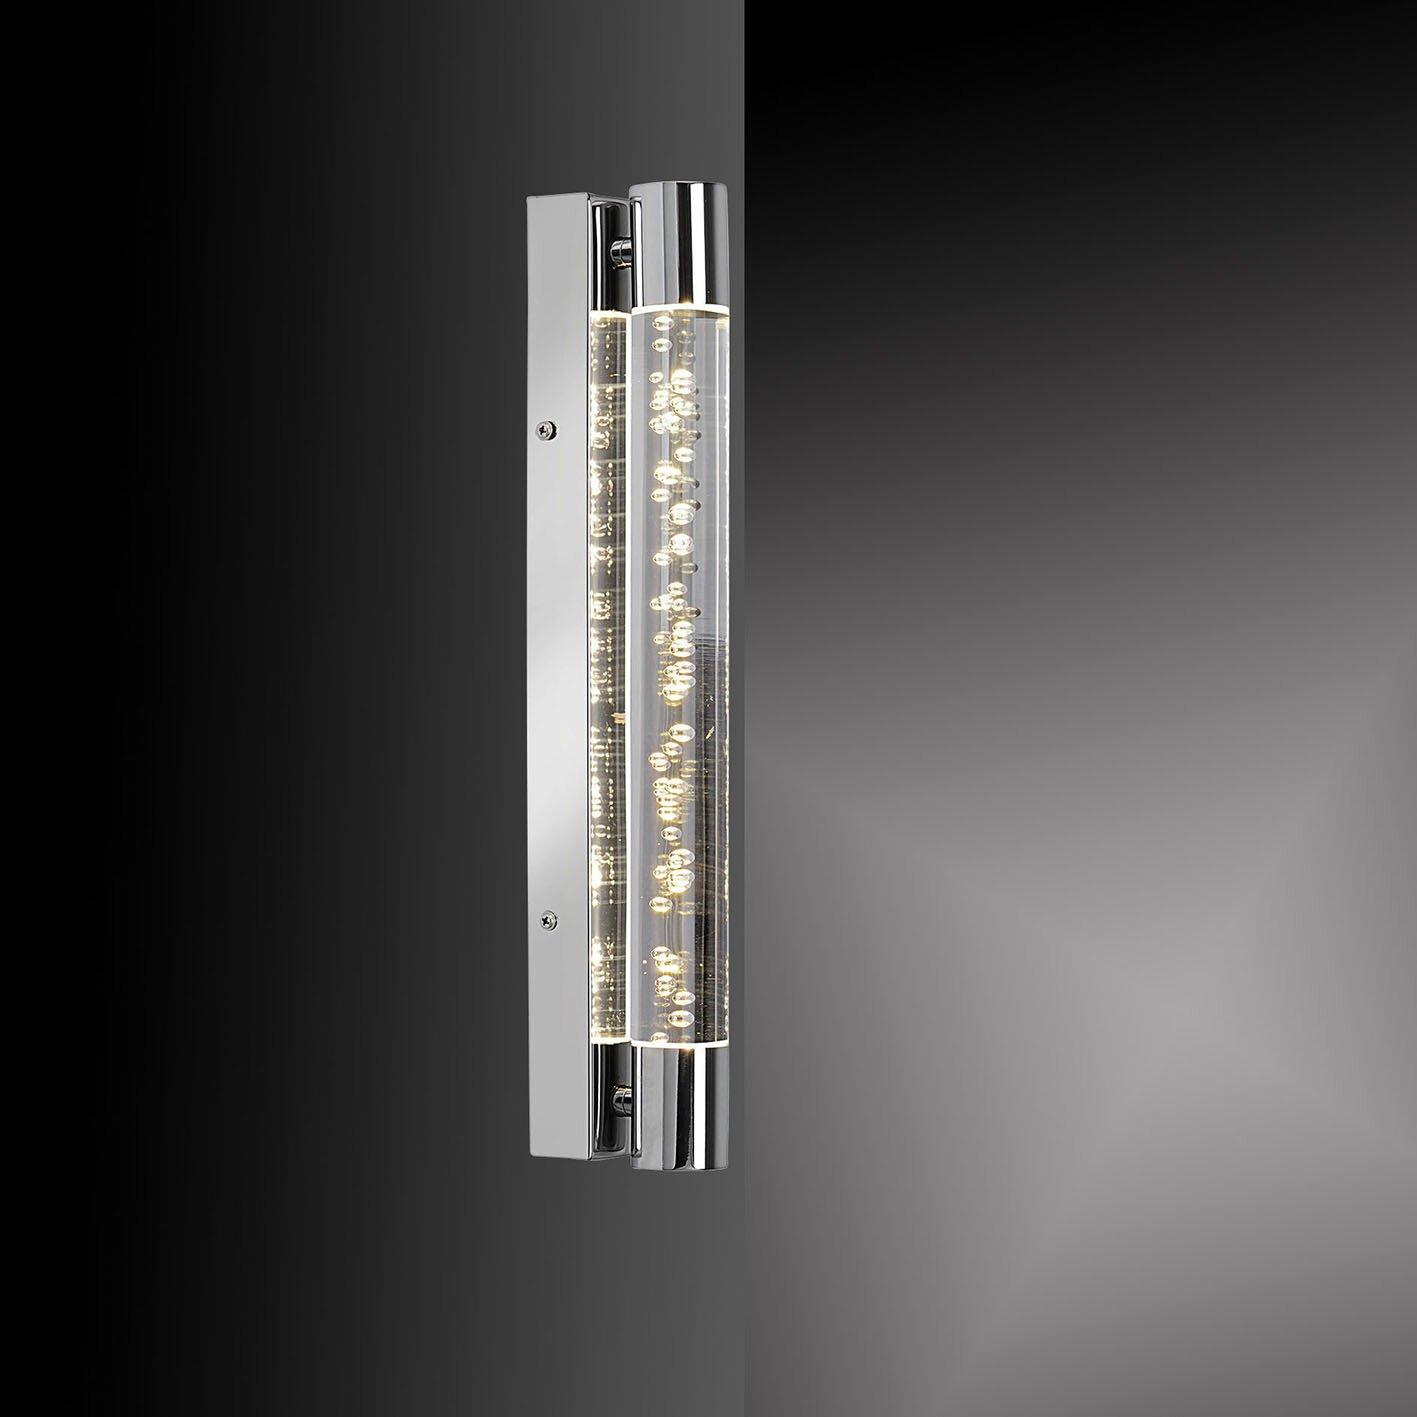 paul neuhaus bubbles 2 light wall light wayfair uk. Black Bedroom Furniture Sets. Home Design Ideas